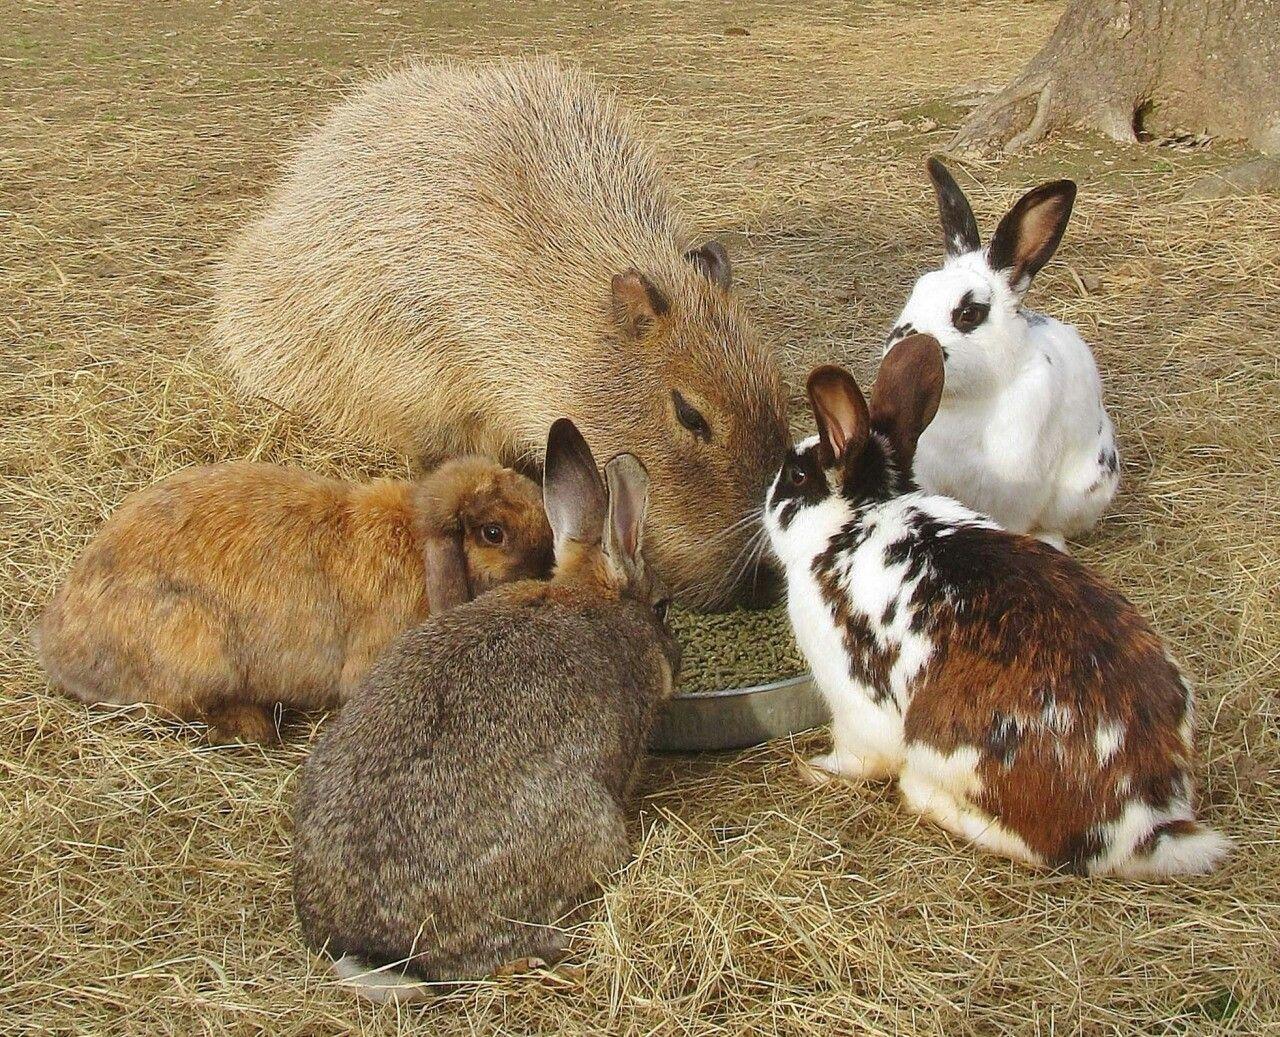 Capybara and bunny friends | Weird animals, Odd animal couples, Funny  animals